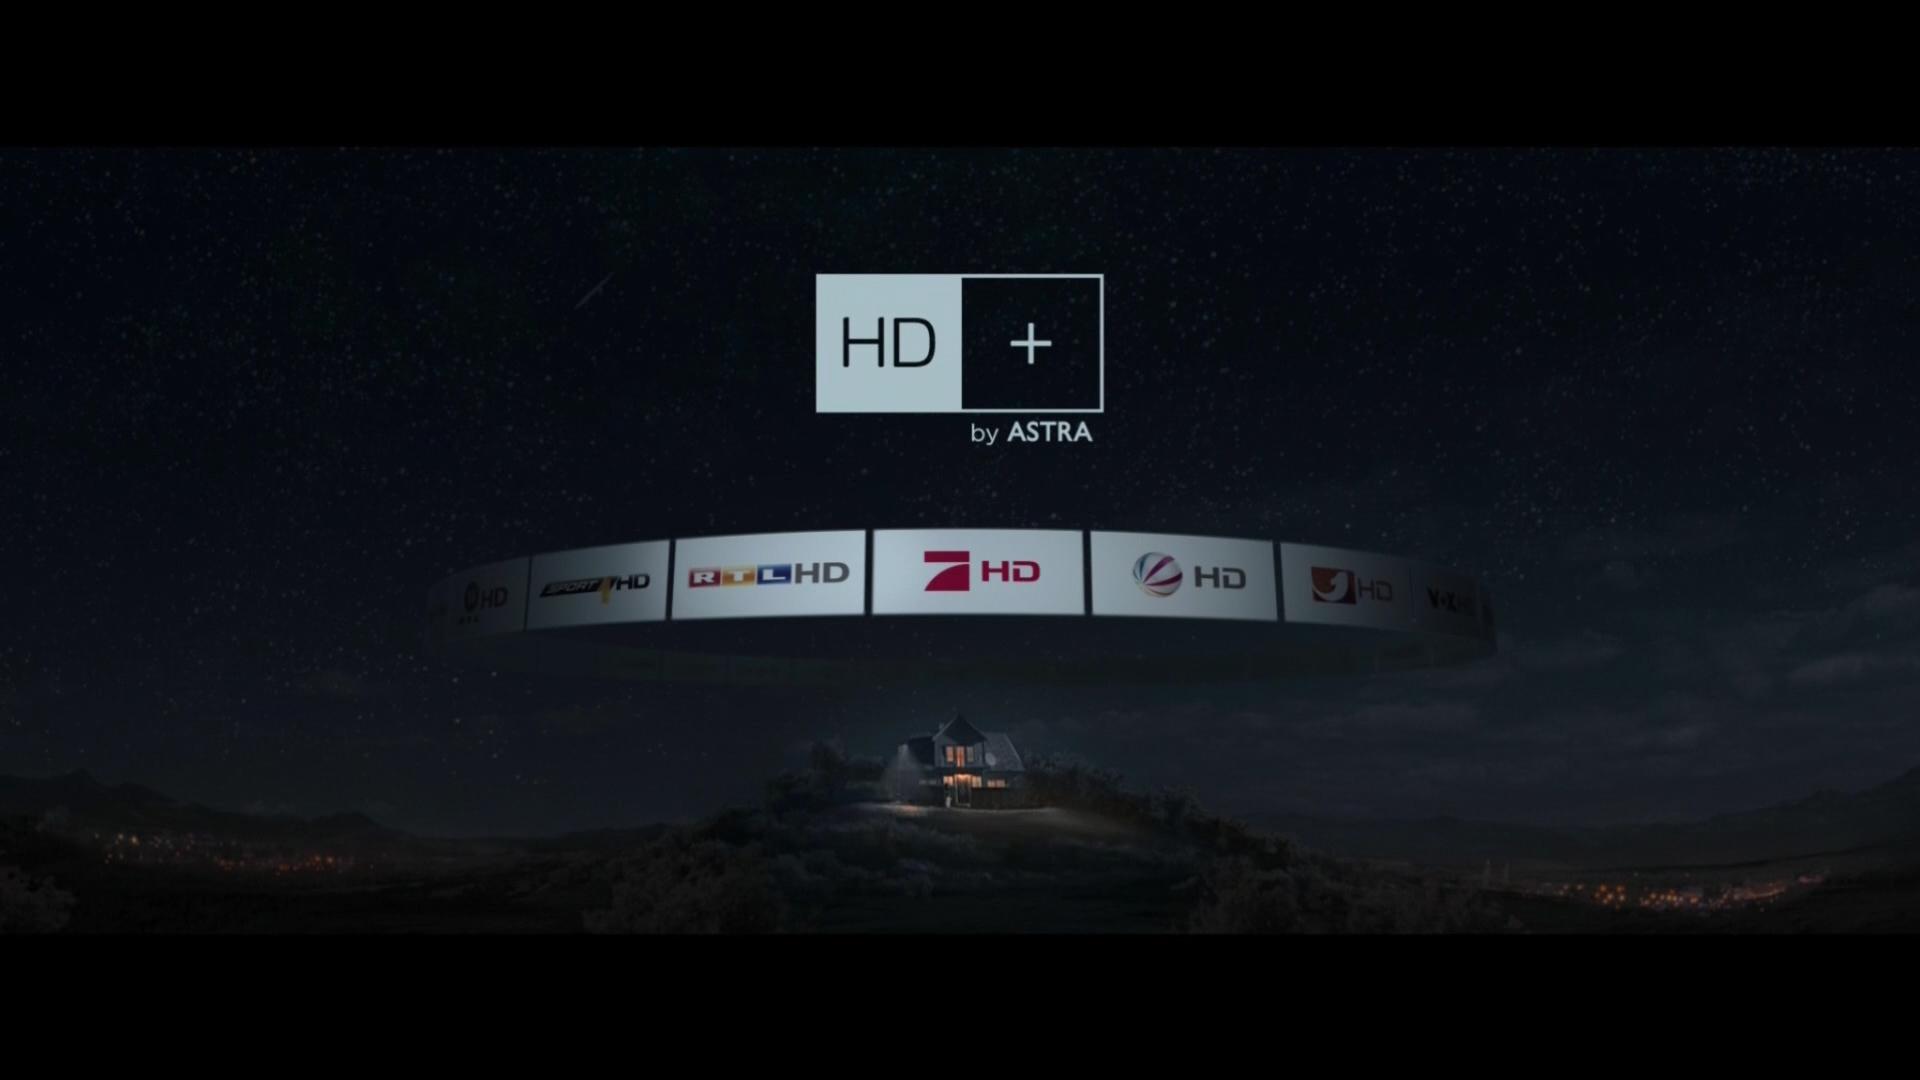 hdsmarttv-demo2